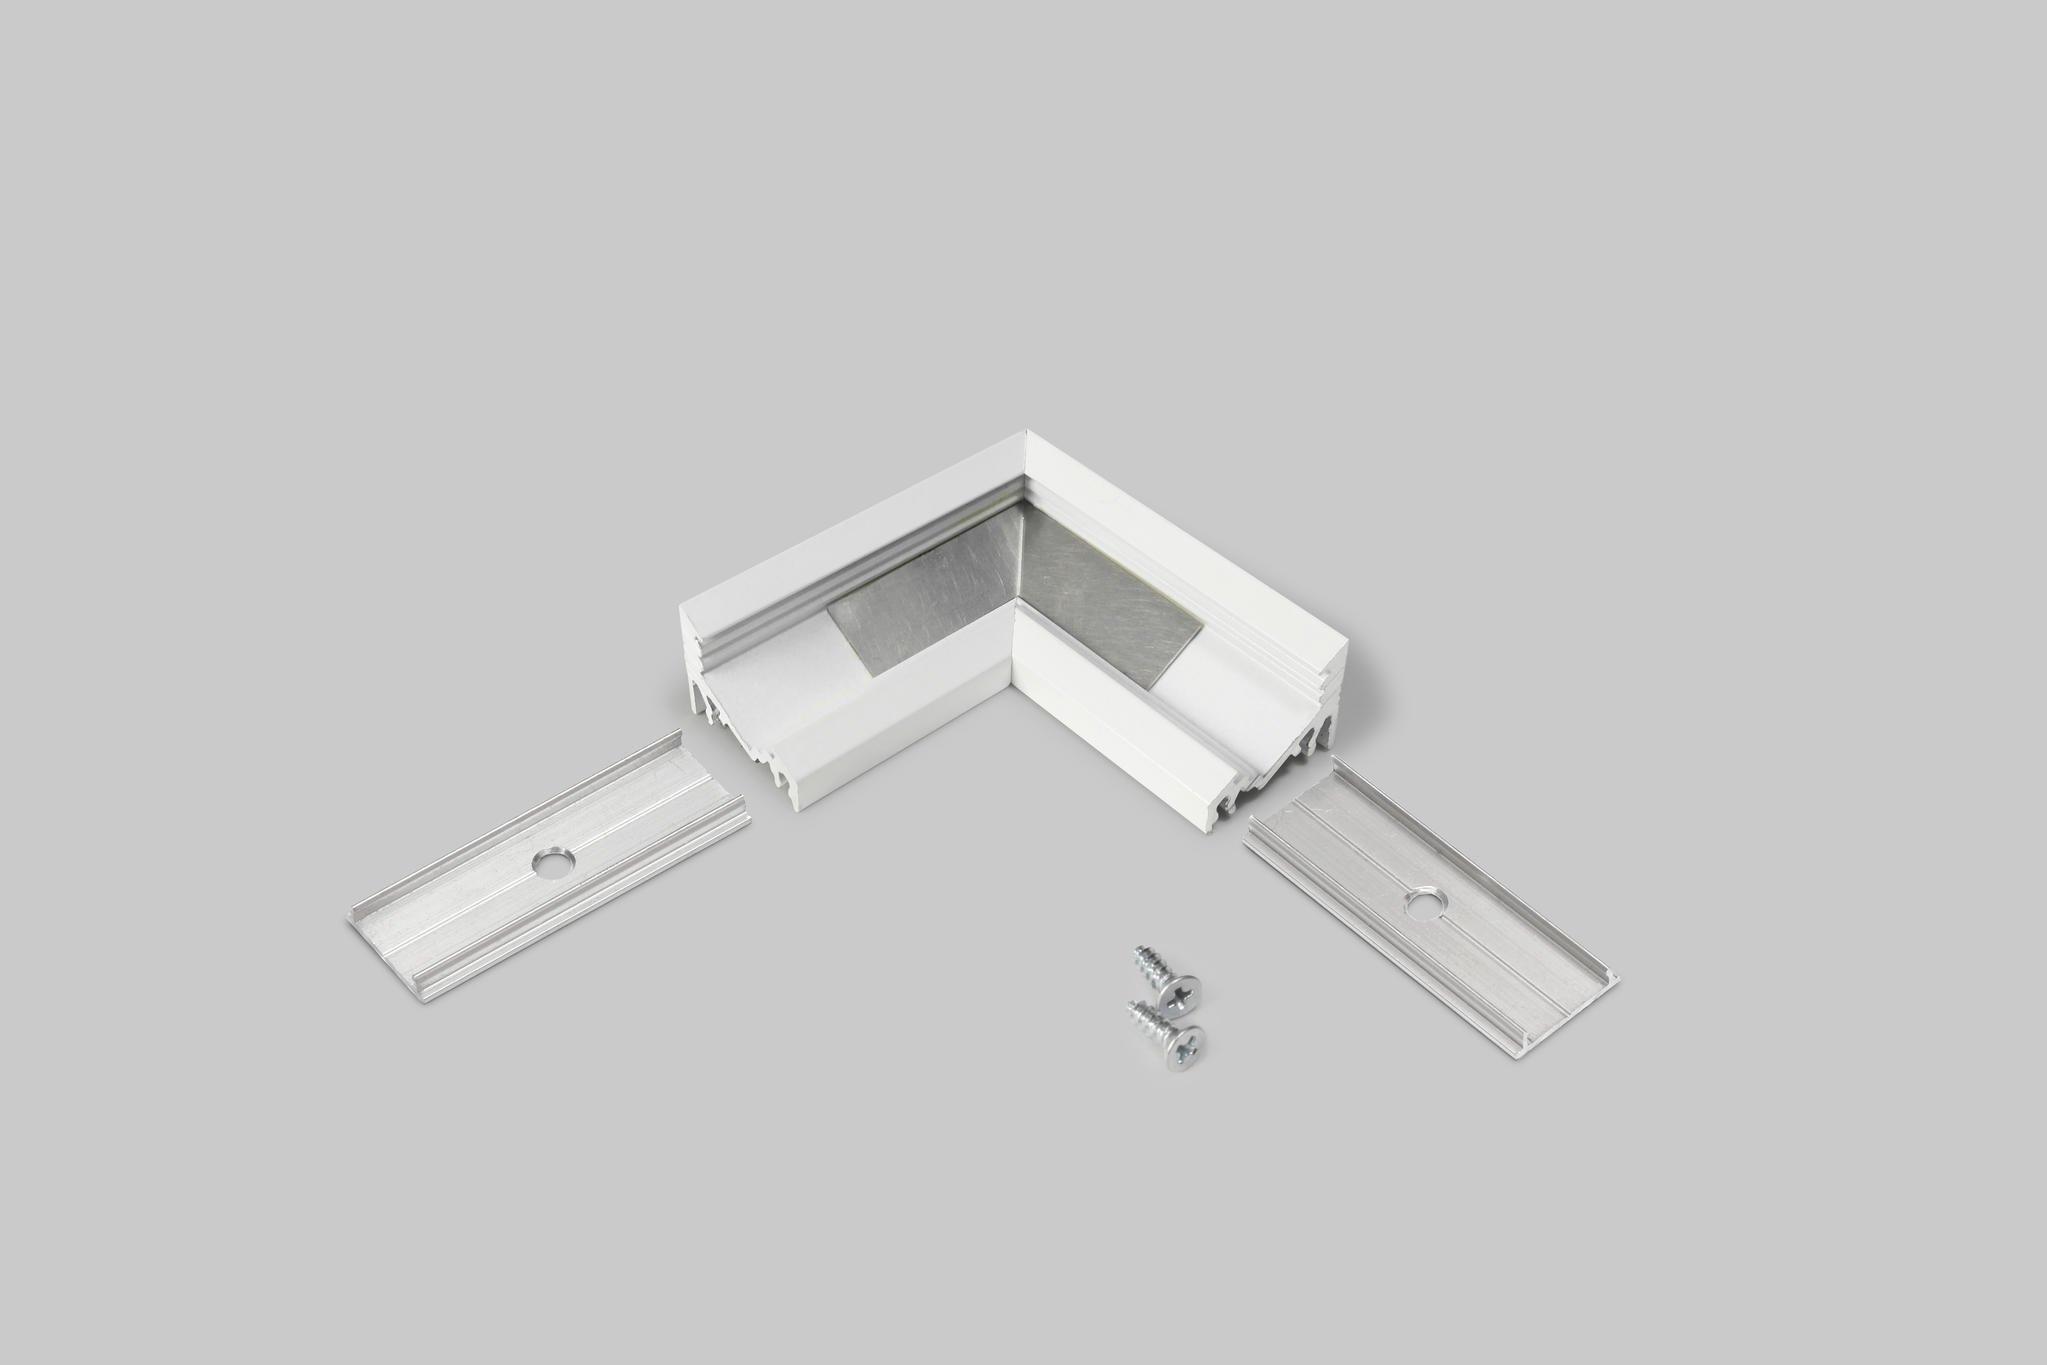 hoek connector voor led profiel wit gelakt